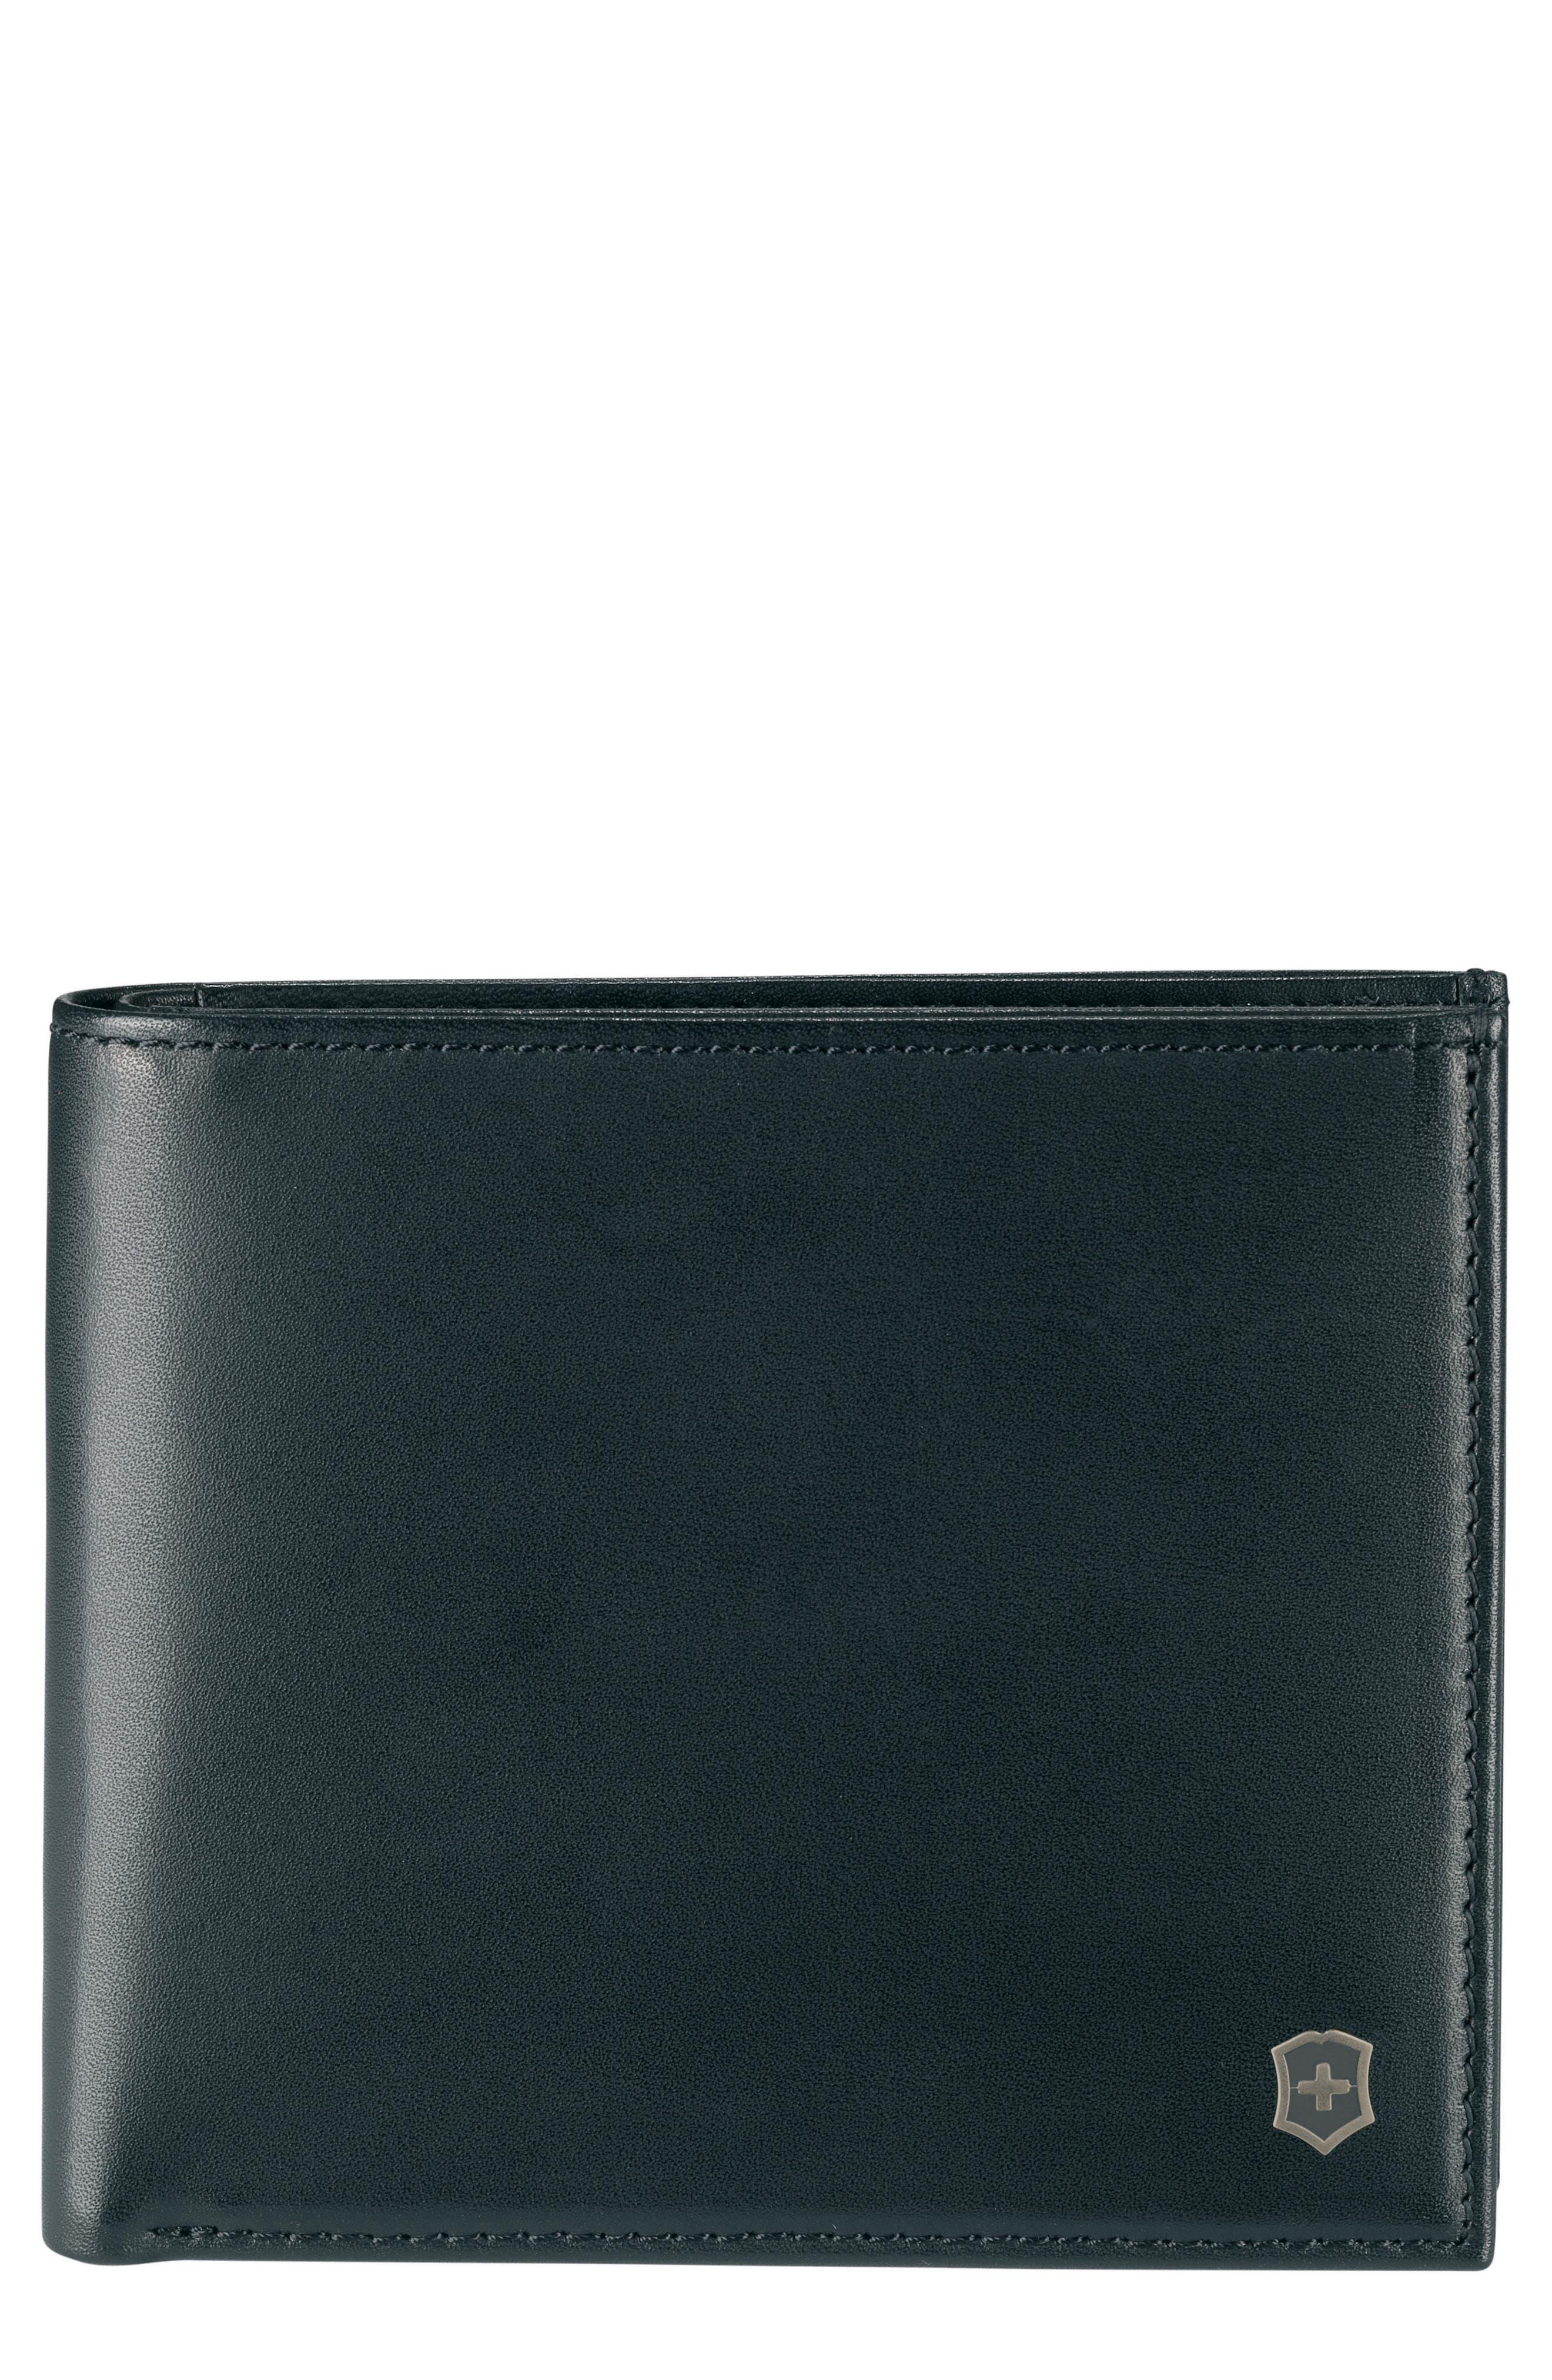 Altius Edge Pythagoras Wallet,                             Main thumbnail 1, color,                             BLACK